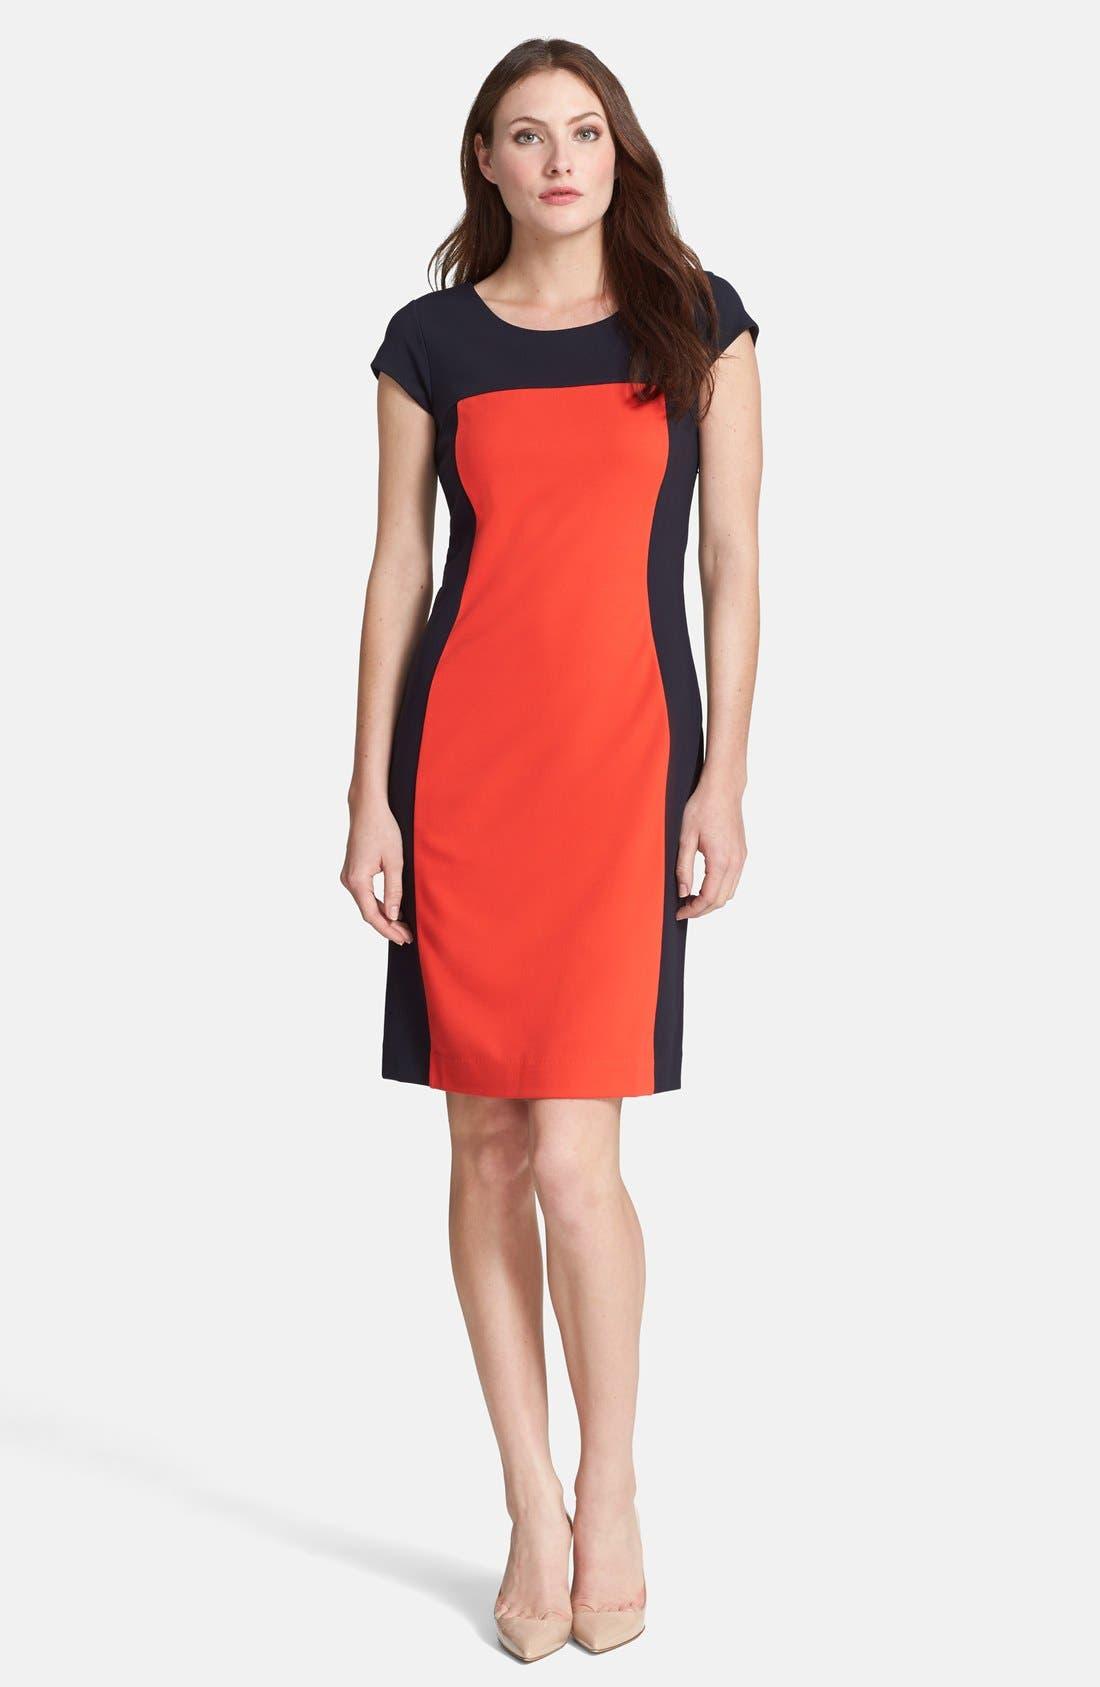 Alternate Image 1 Selected - BOSS HUGO BOSS Colorblock Jersey Dress